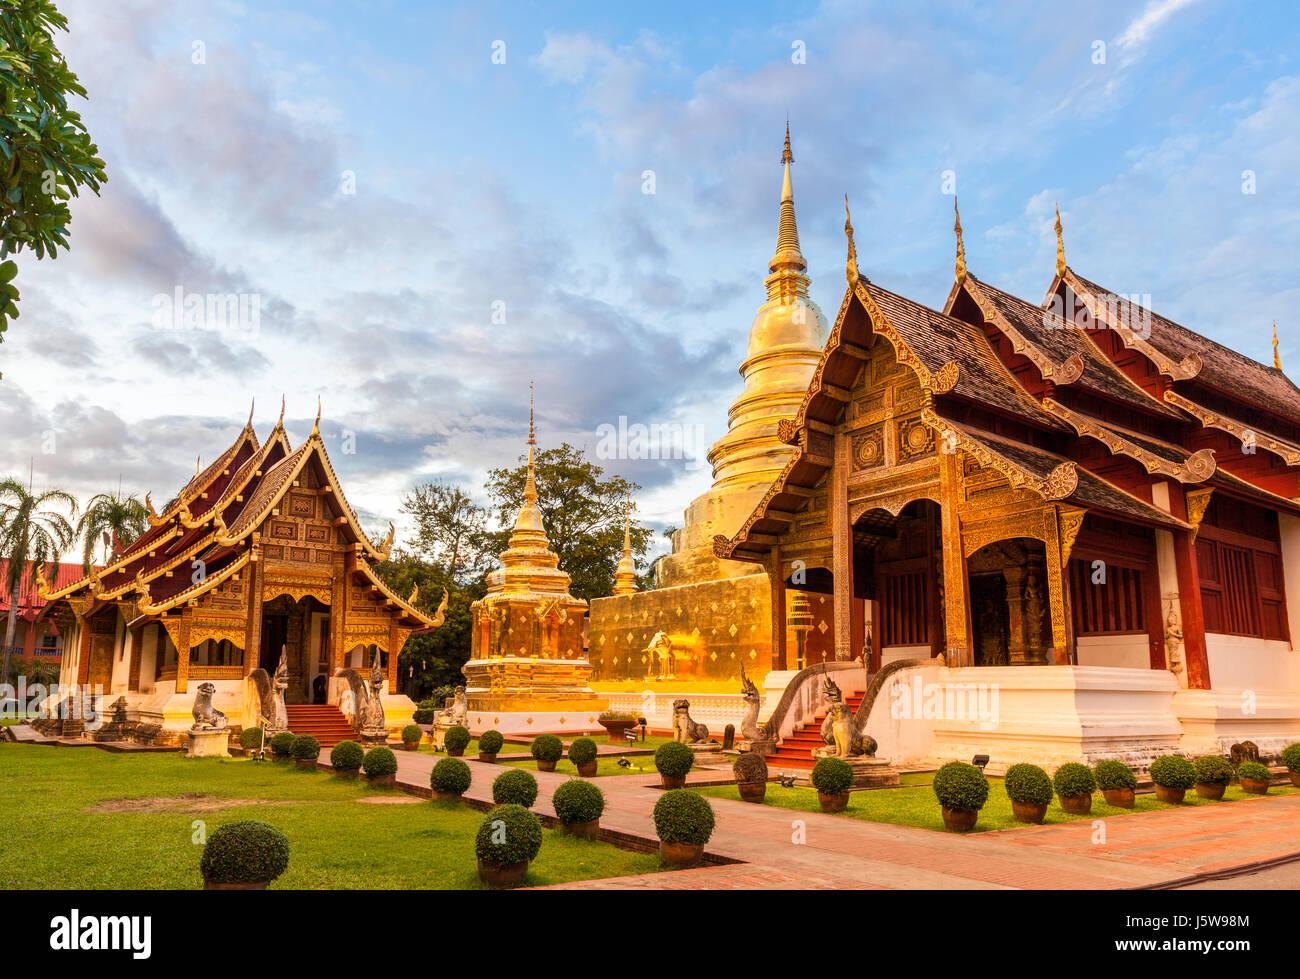 Wat Phra Singh Woramahaviharn. Temple bouddhiste de Chiang Mai, Thaïlande. Photo Stock